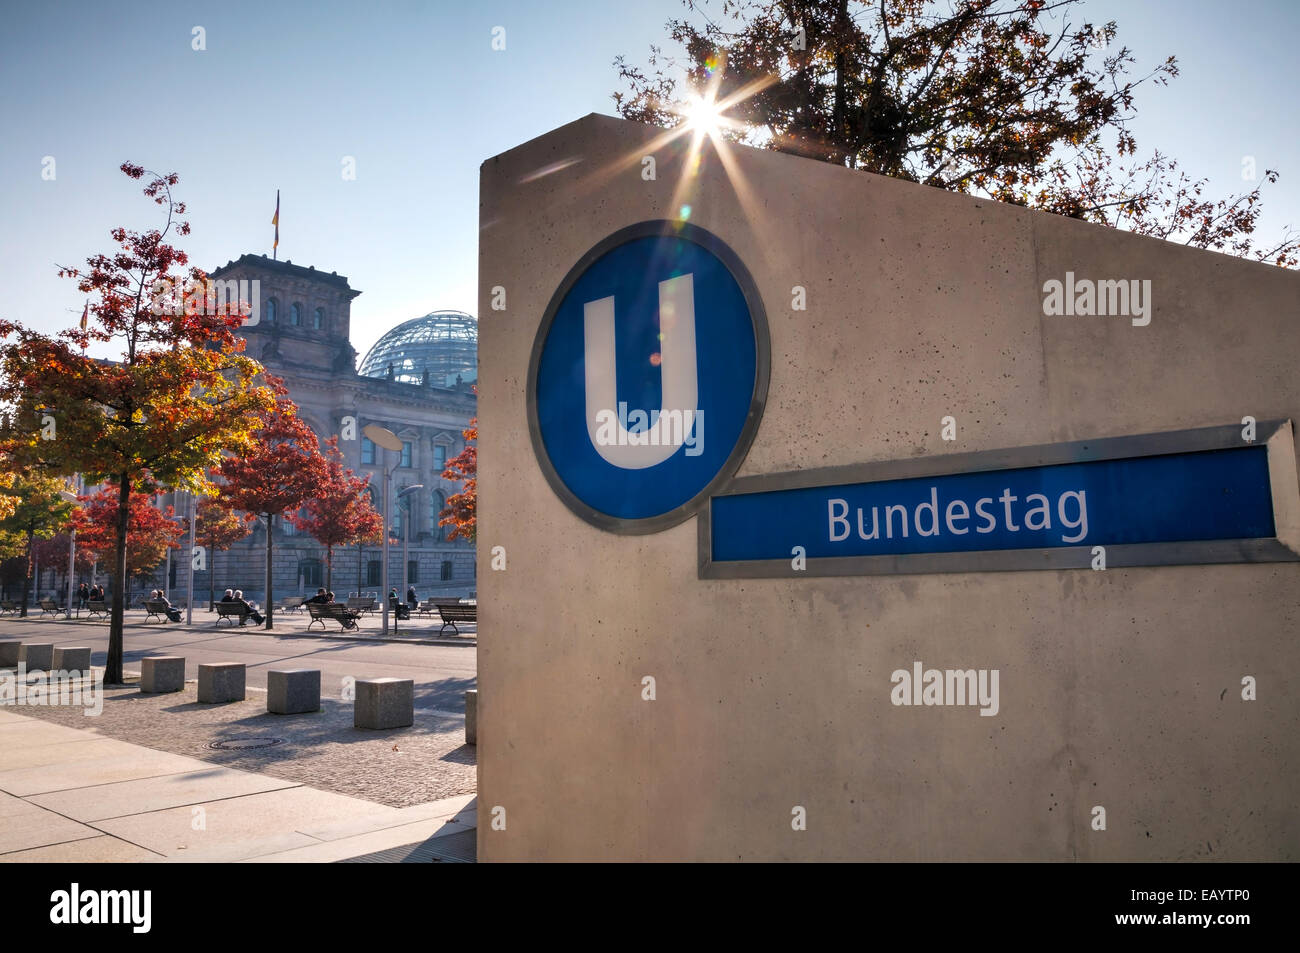 Bundestag underground sign in Berlin, Germany - Stock Image